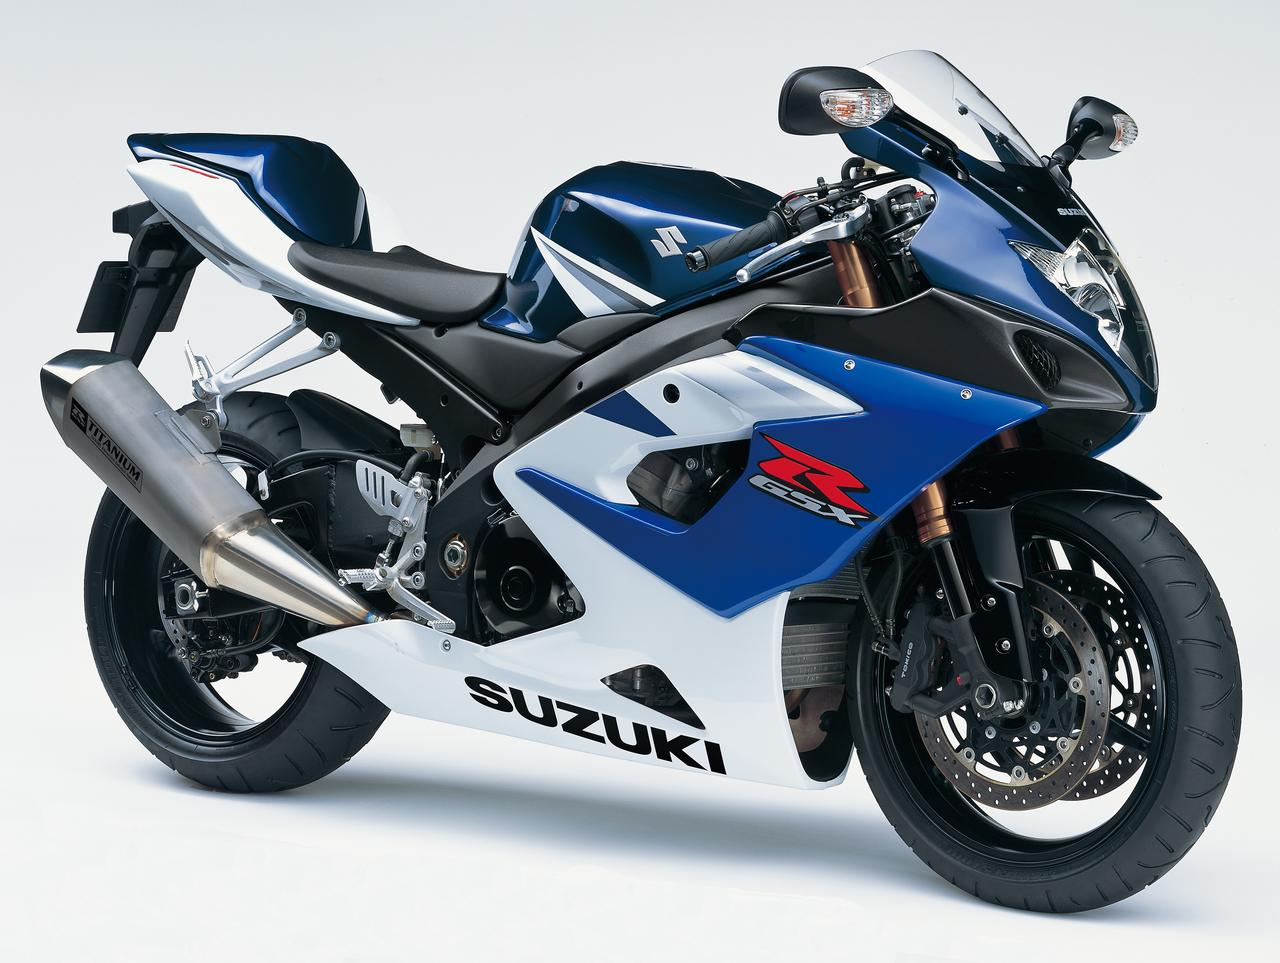 Images : 8番目の画像 - 「GSX Brand Family クロニカル 『SUZUKI GSX-R1000』#RIDE」のアルバム - webオートバイ